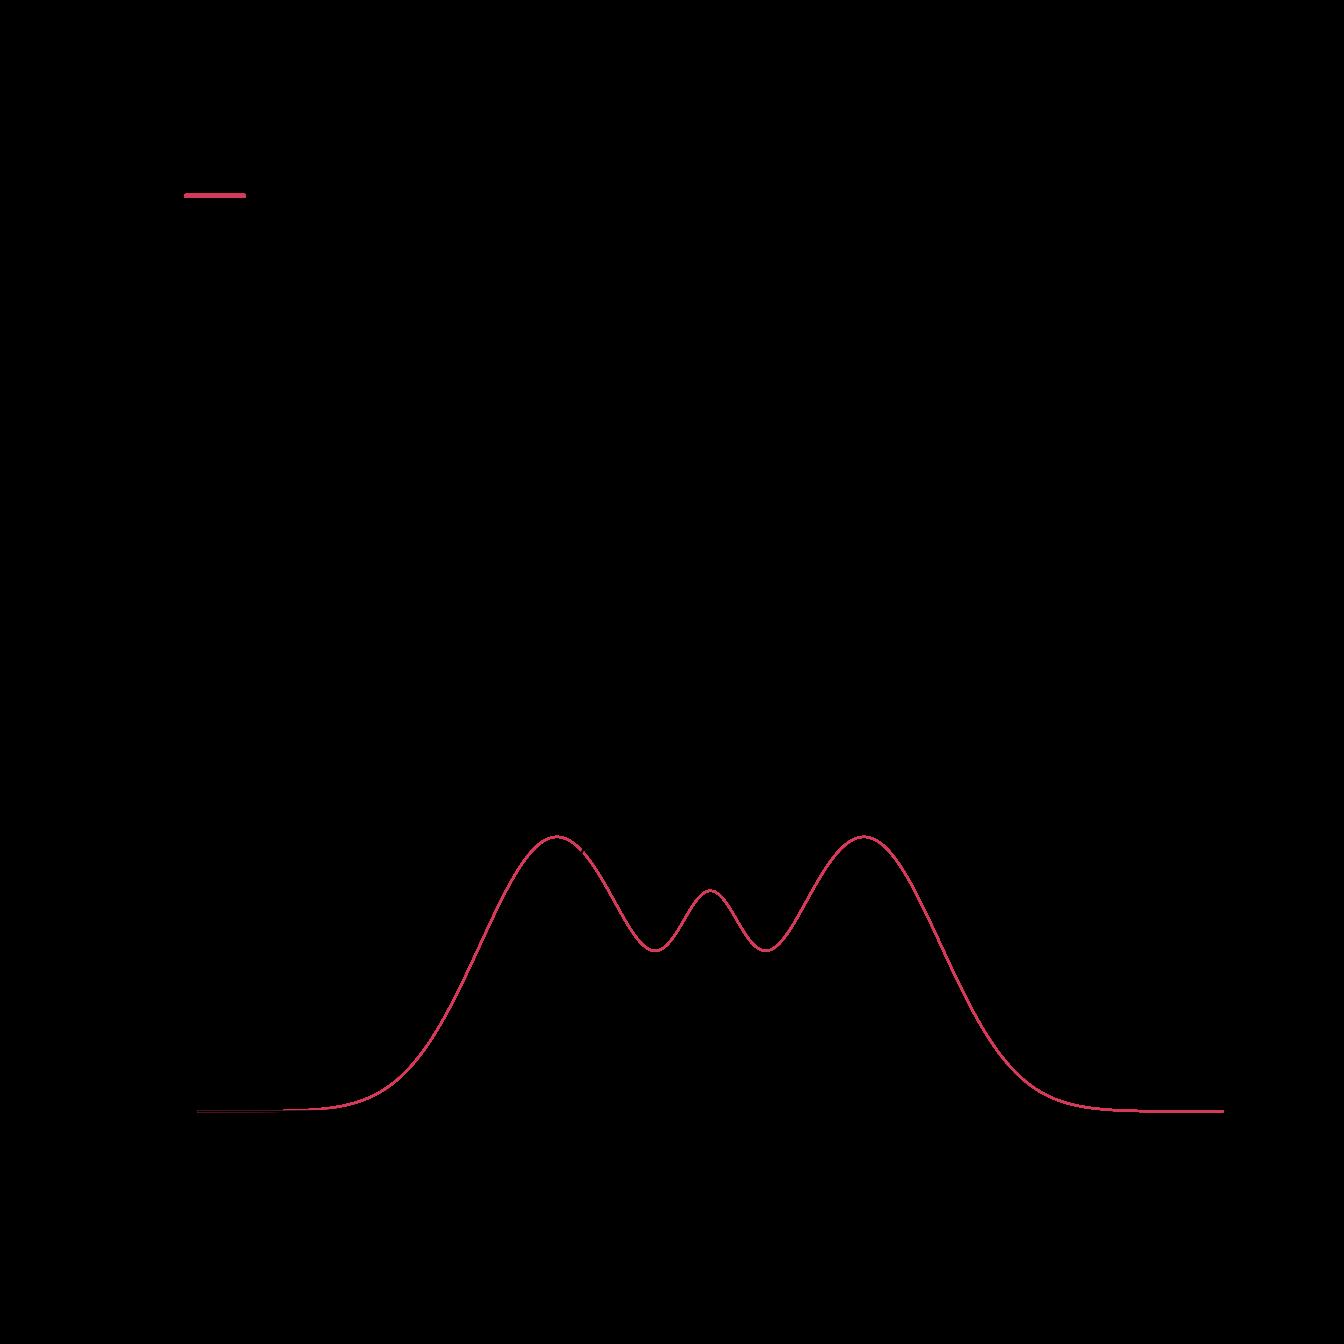 Chapter 2 Kernel density estimation I   Notes for Nonparametric